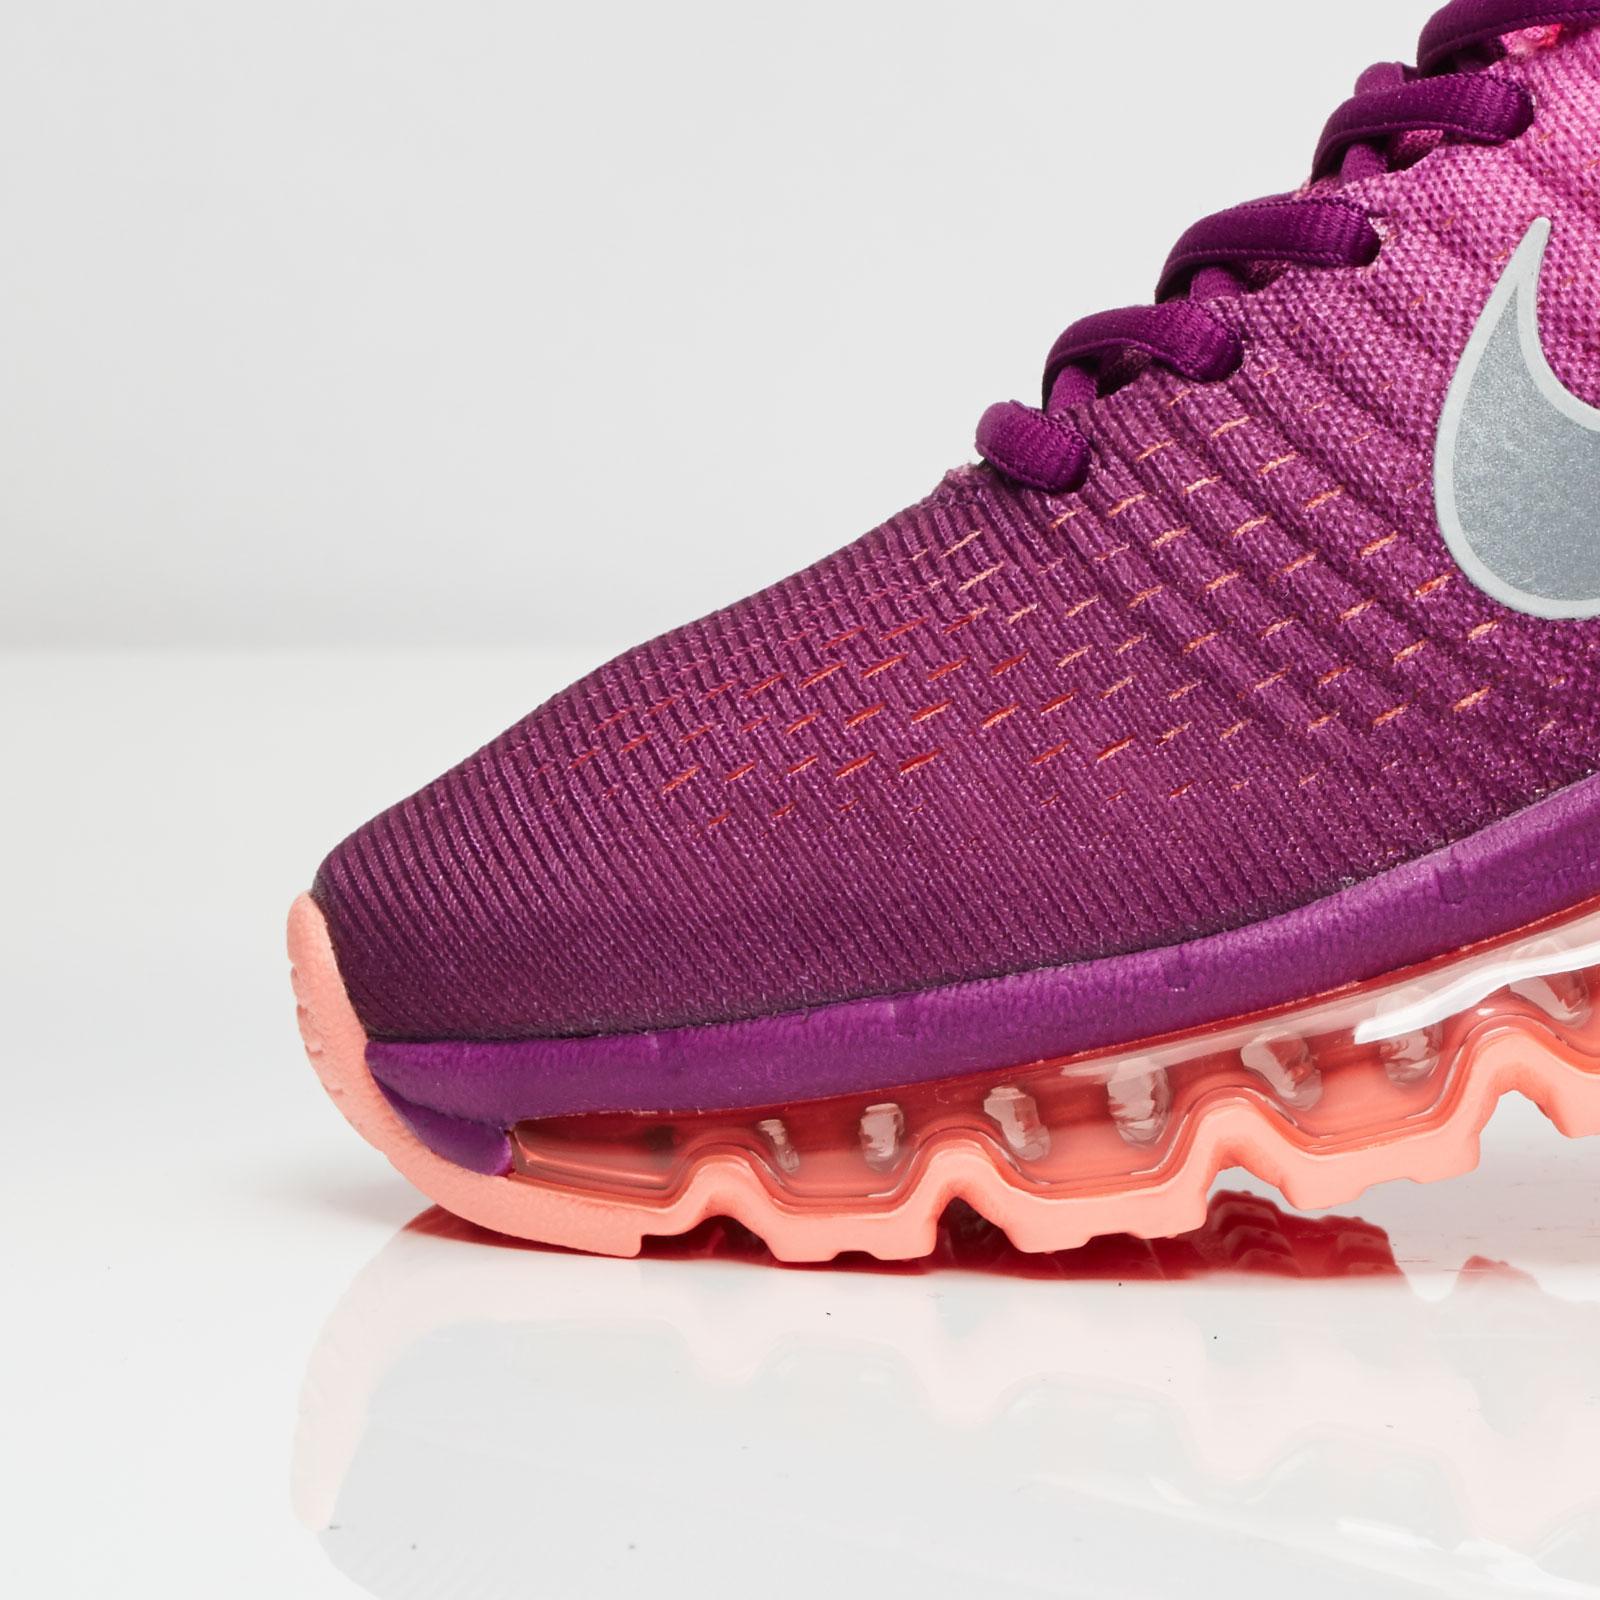 sale retailer 2c779 14e67 Nike Wmns Air Max 2017 - 849560-502 - Sneakersnstuff   sneakers    streetwear online since 1999